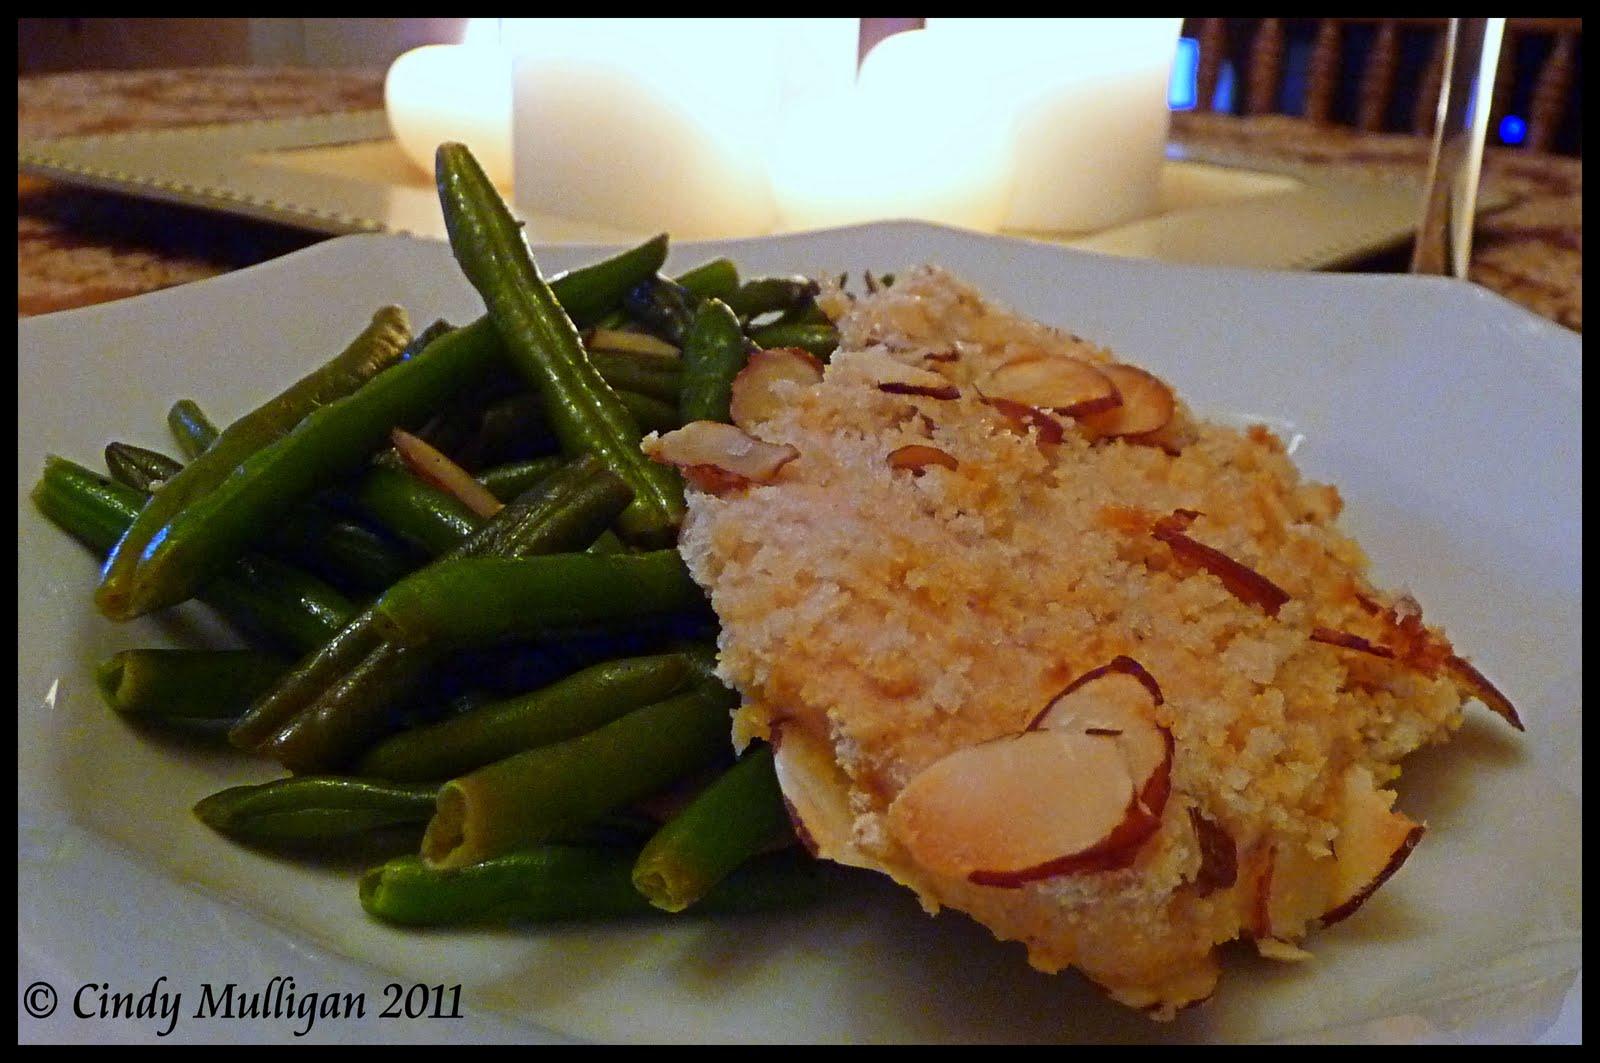 http://1.bp.blogspot.com/-eKa3T22MruA/Te71IcPT0-I/AAAAAAAAEhc/fwo9WFGiiAo/s1600/Chicken+Almondine+%2526+Green+Beans1.jpg